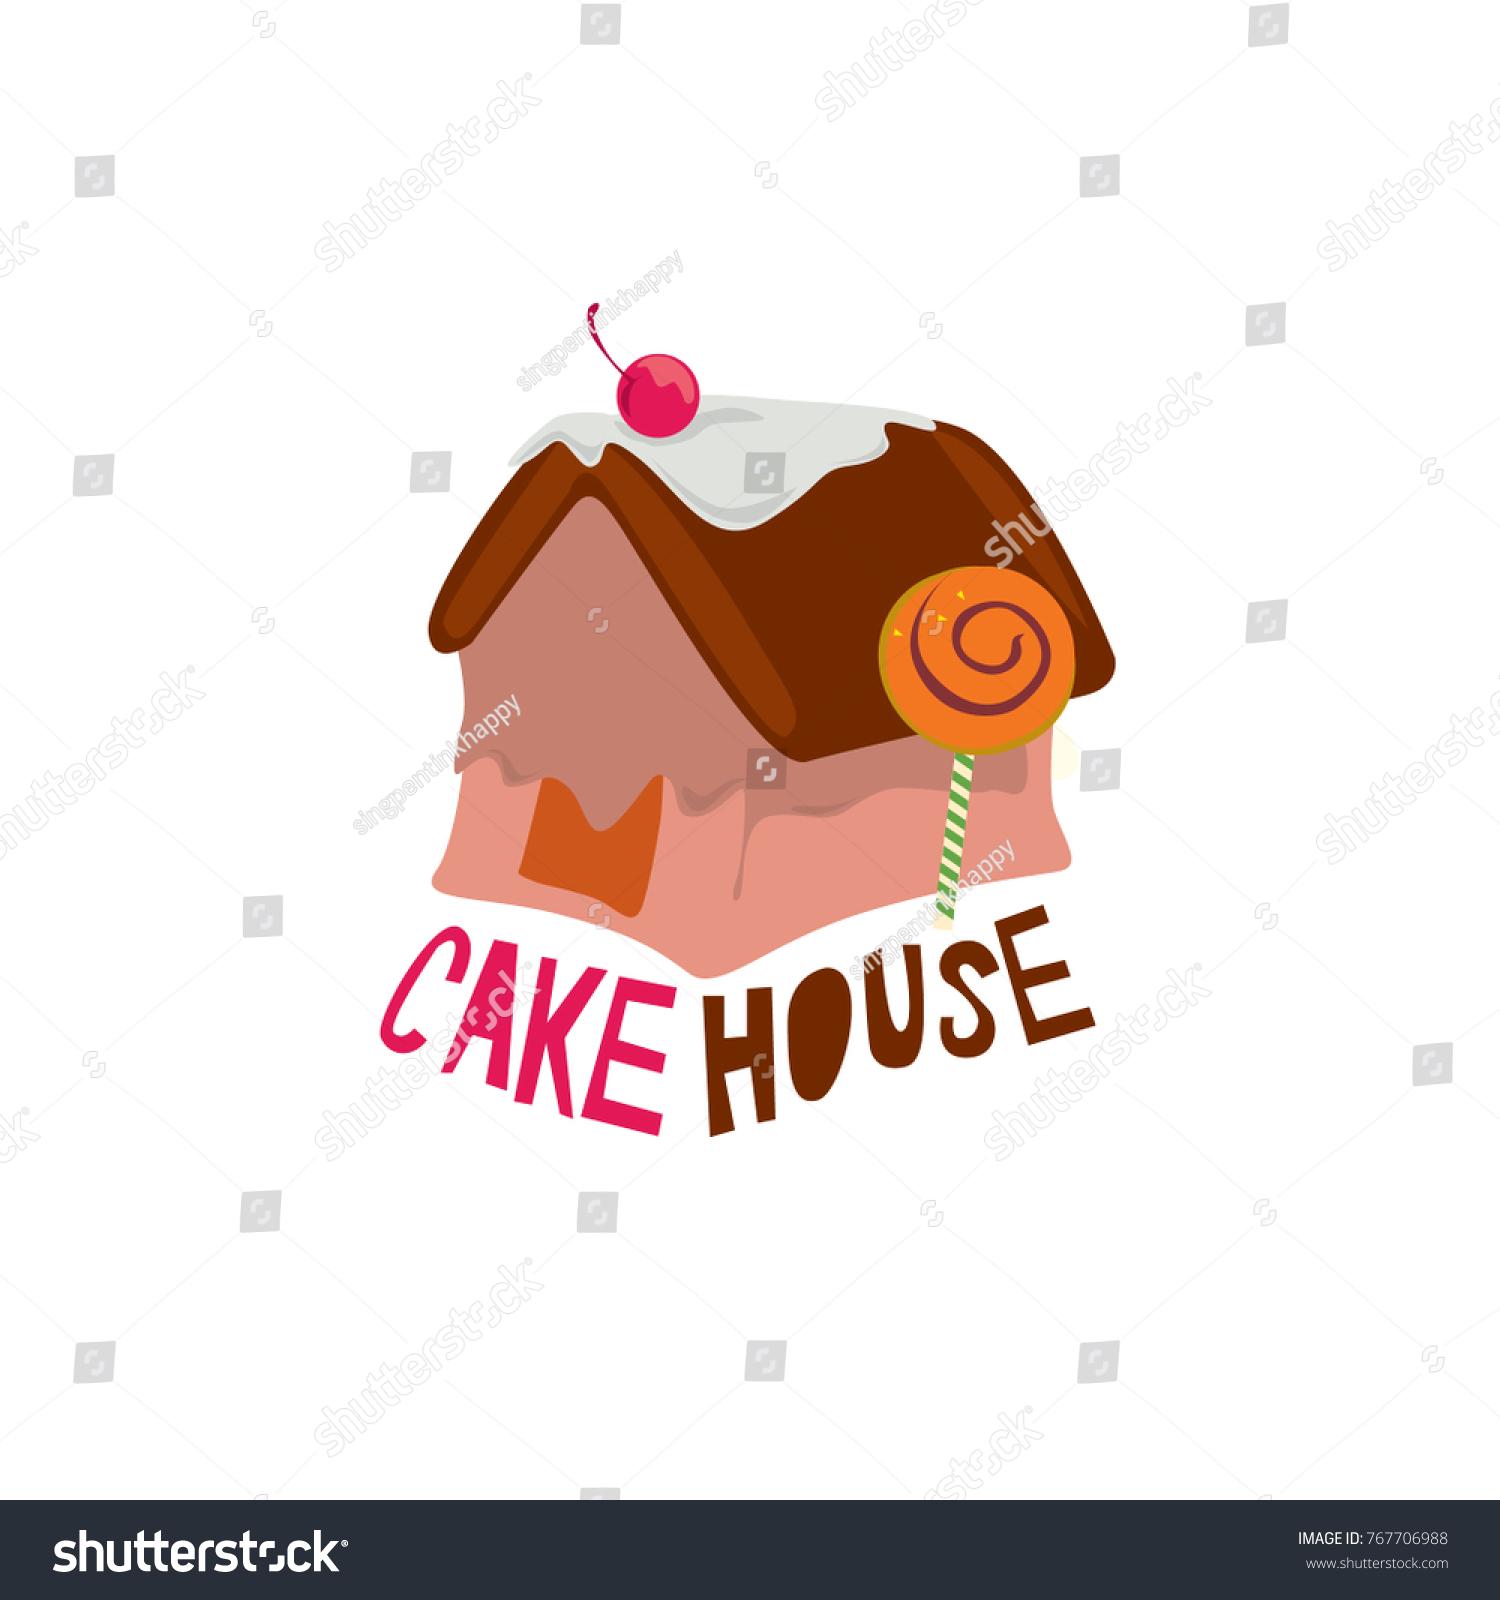 Cake House Logo Logo Cake Bakery Stock Vector Royalty Free